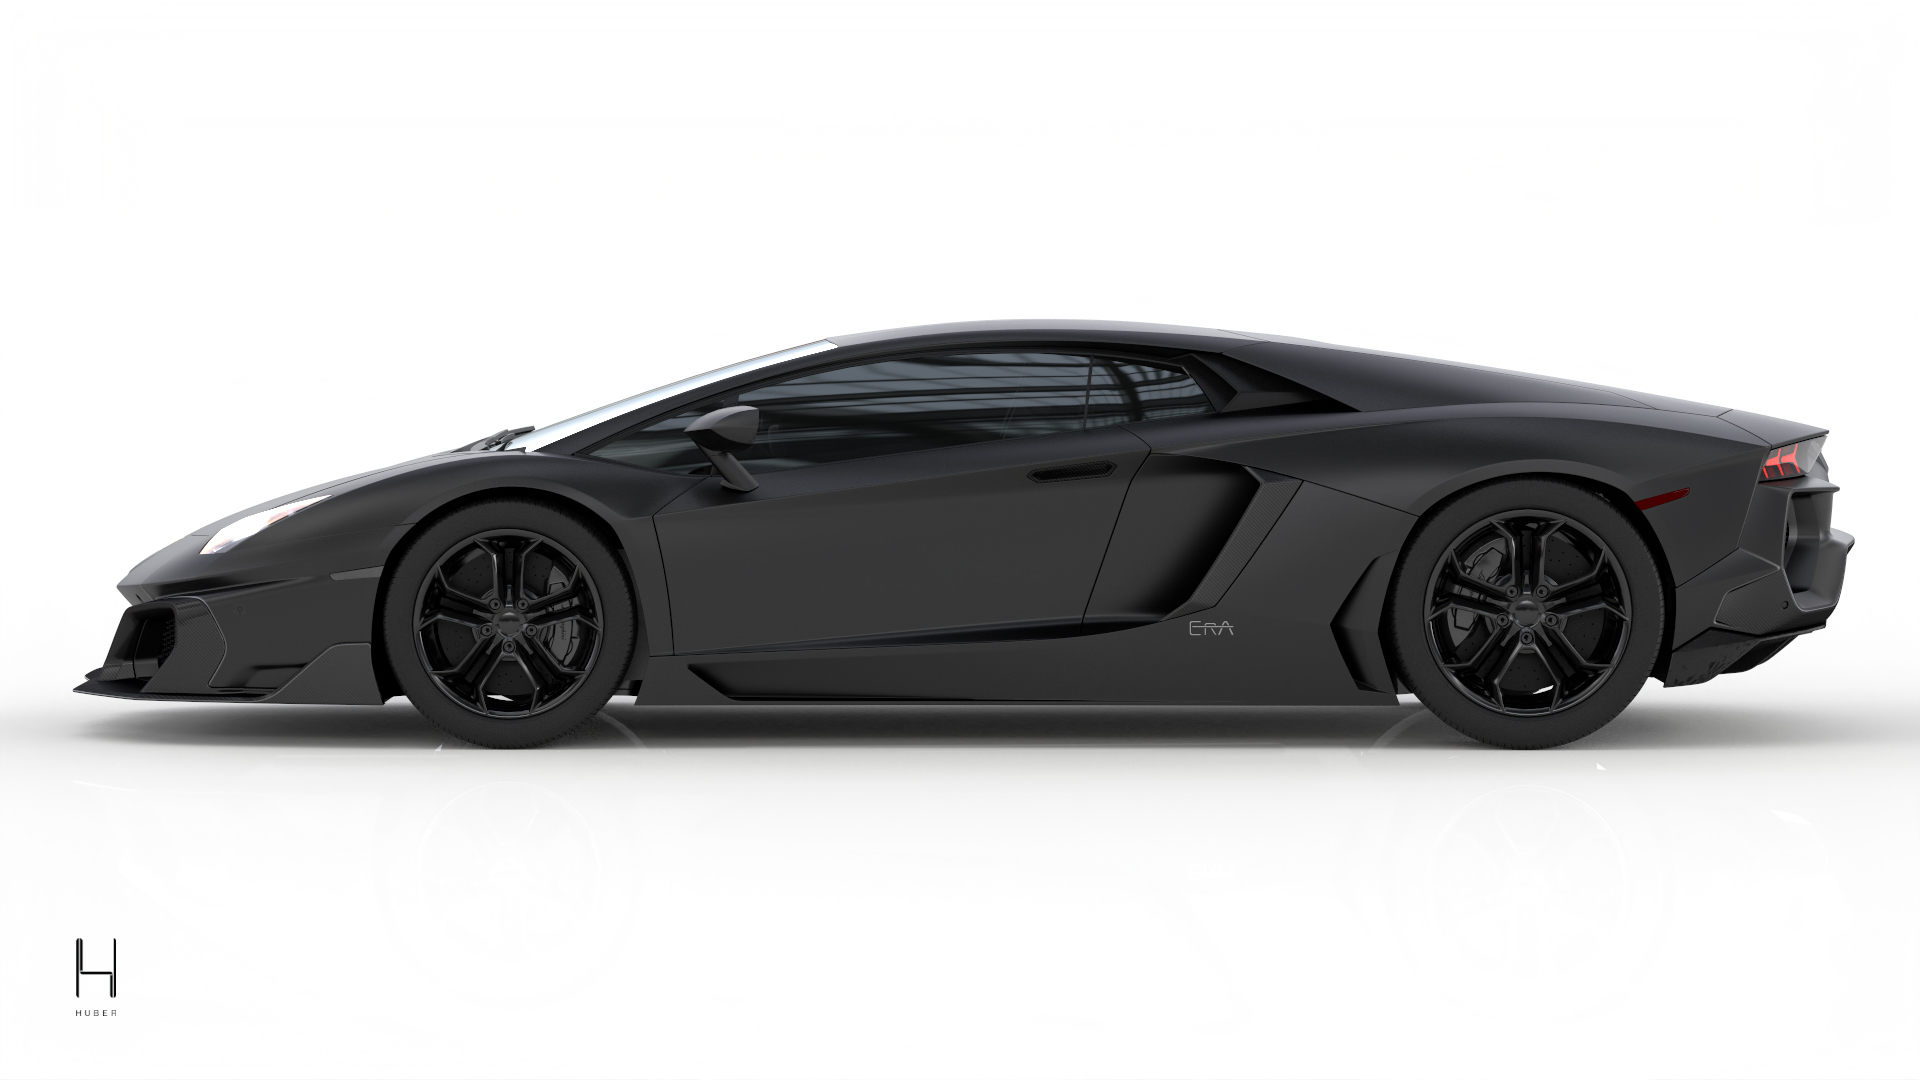 Lamborghini-Aventador-Huber-7